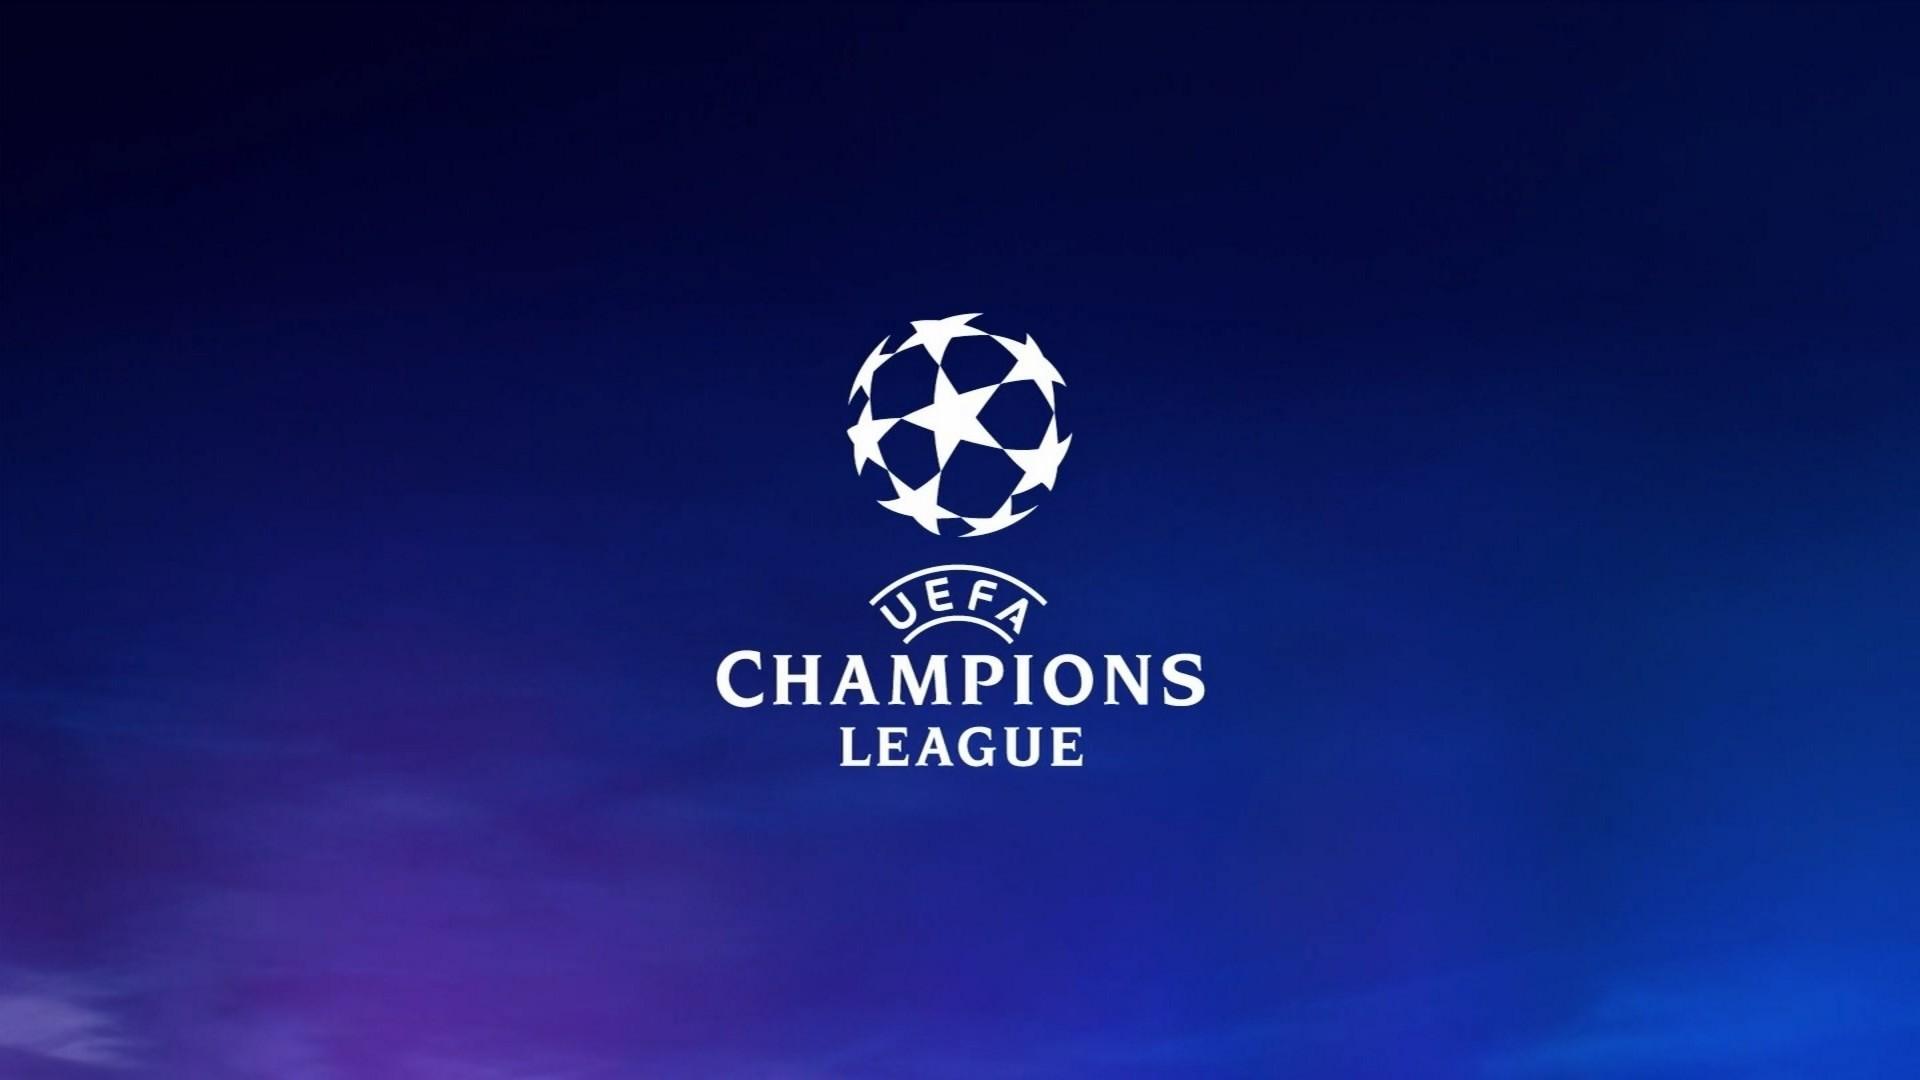 Futbol Uefa Champions League 19 20 Group Stage Draw 29